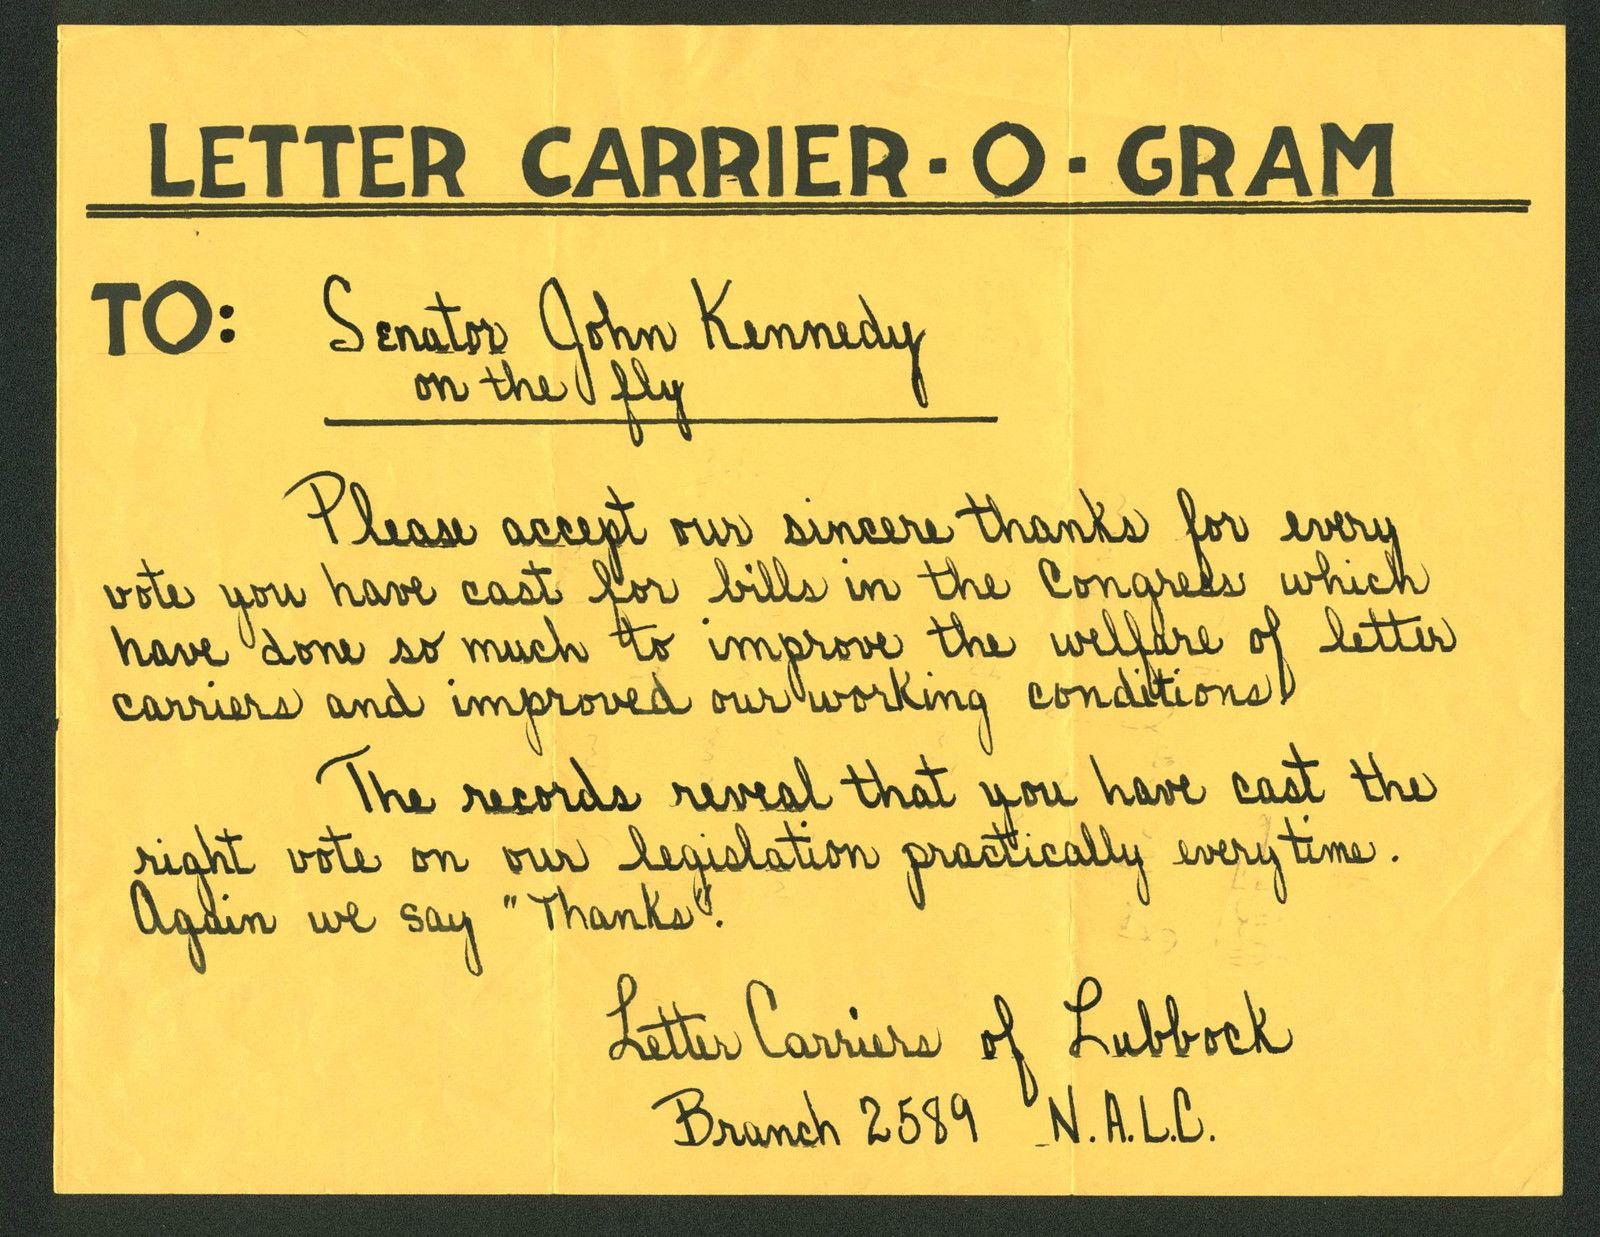 john-f-kennedy-authentic-handwriting-on-8-5x11-paper-as-senator-jsa-z02612-2